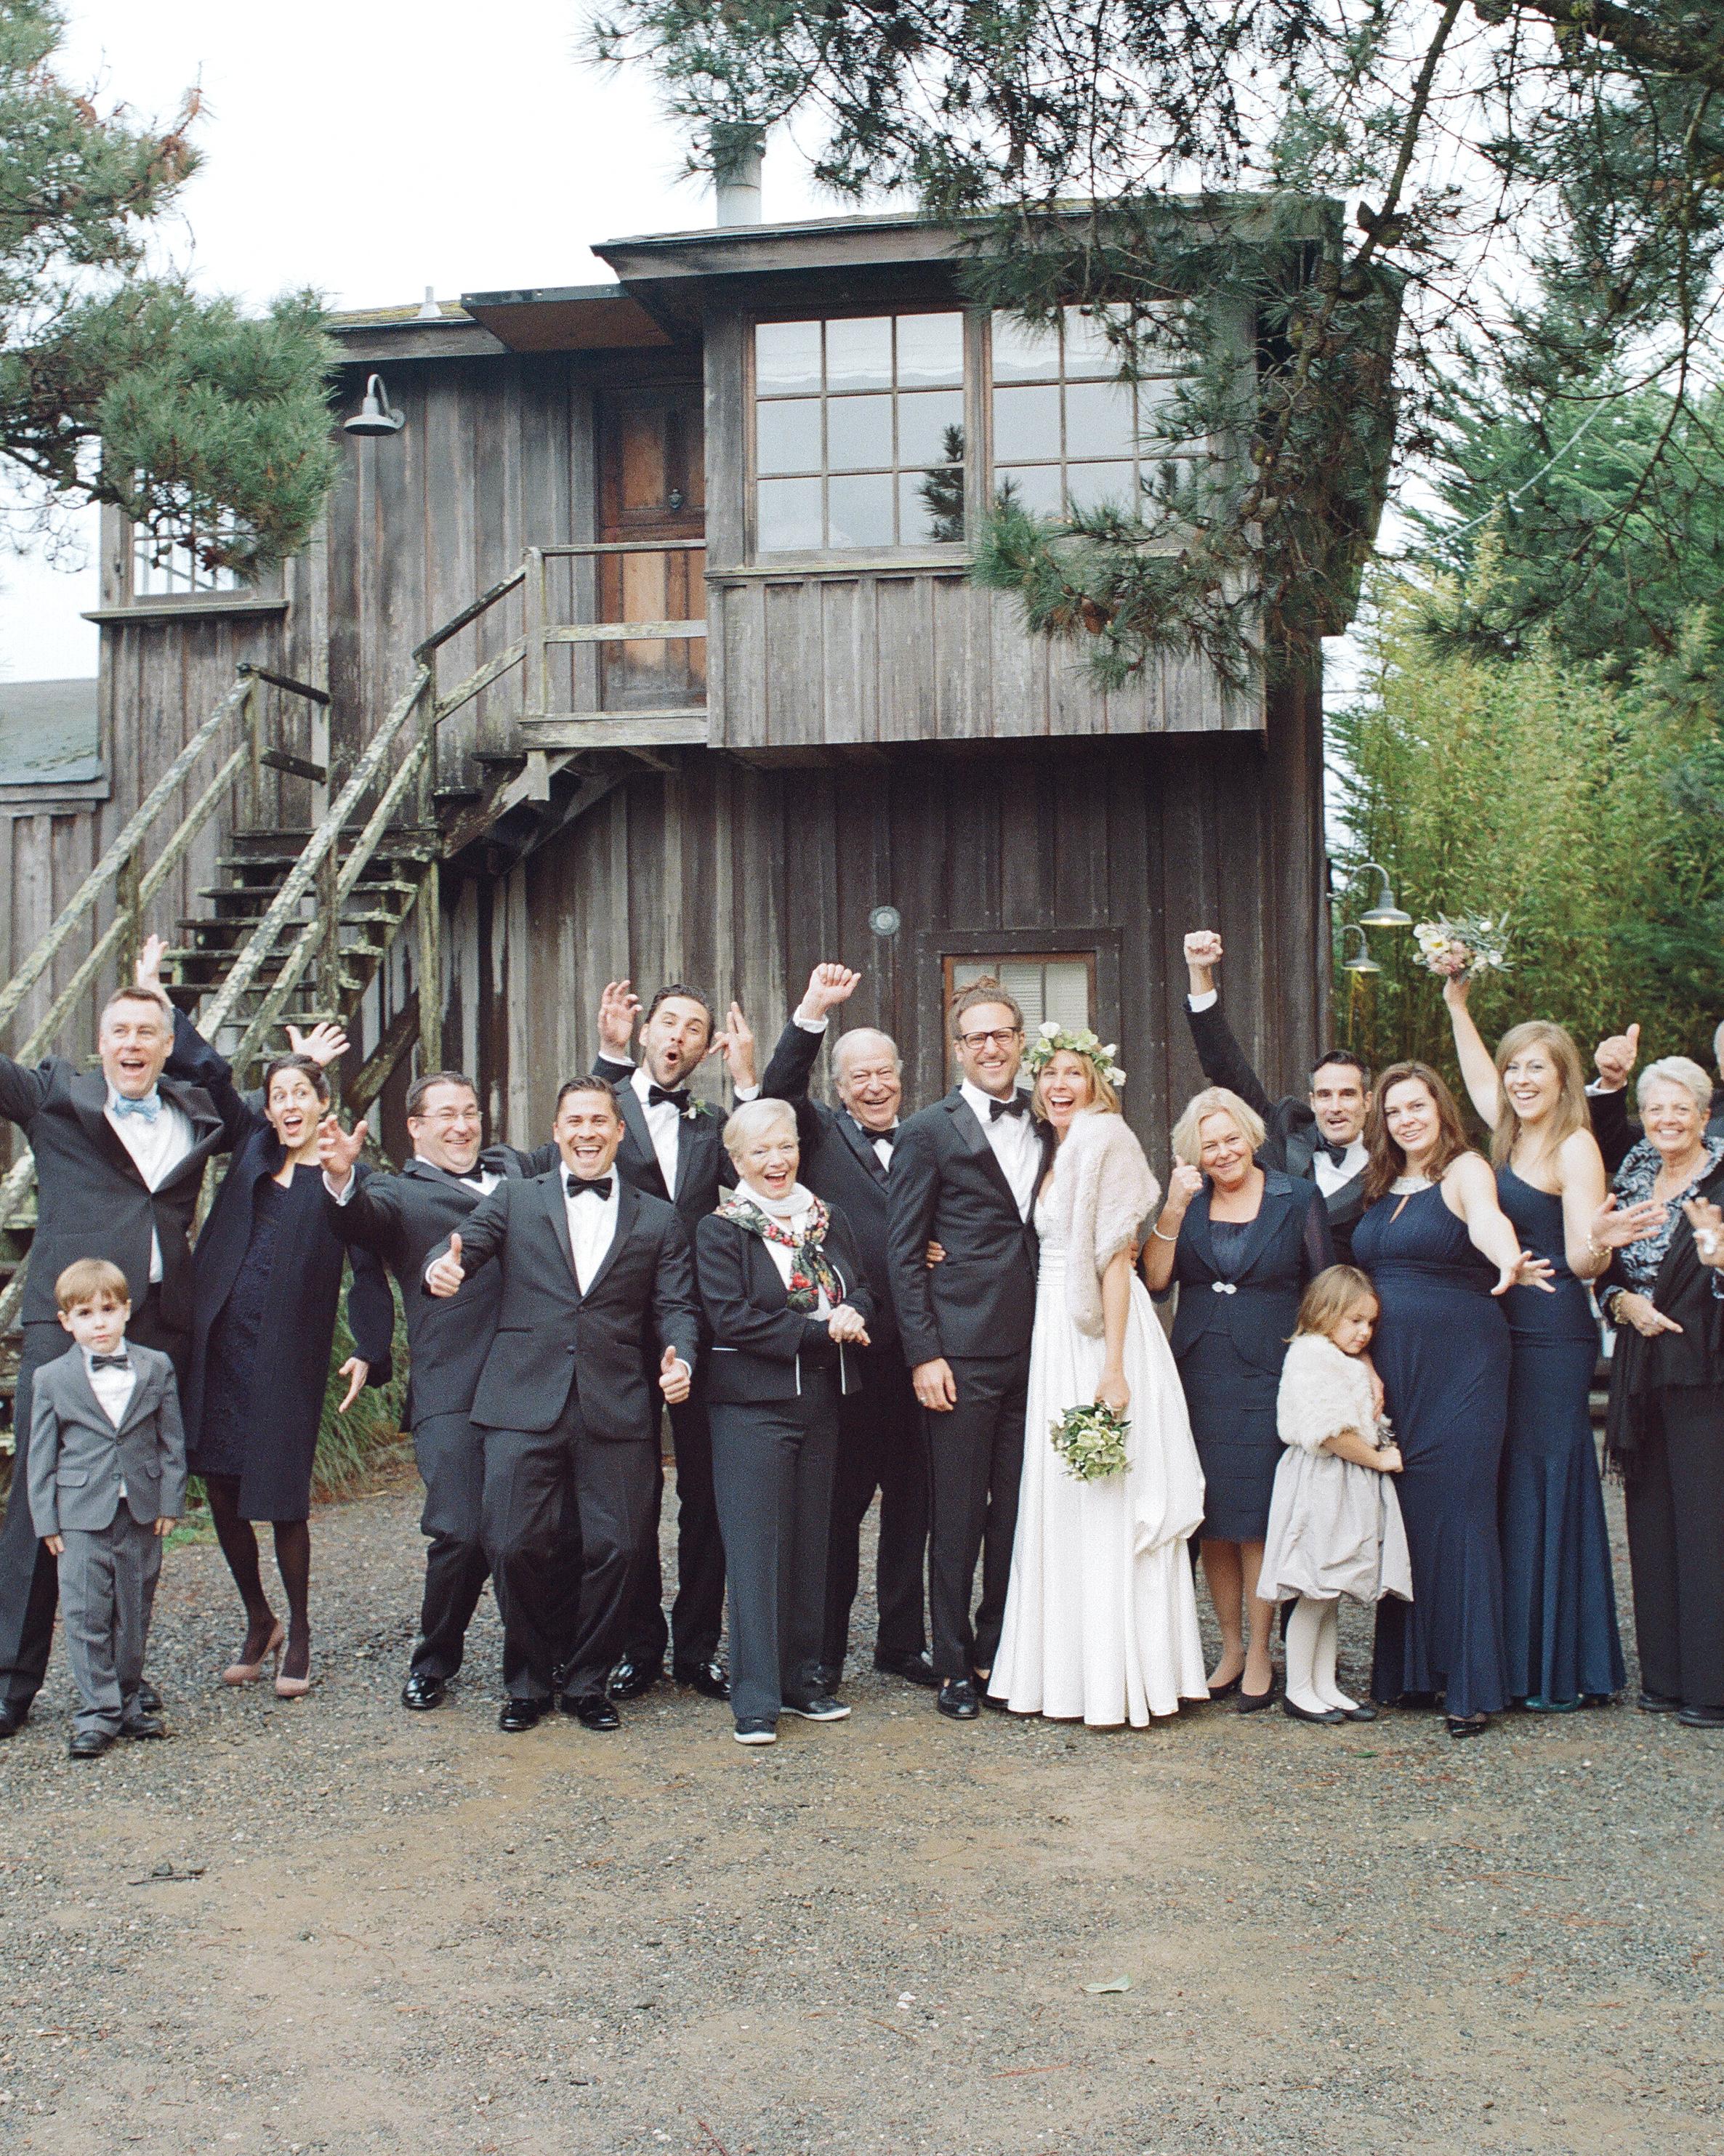 alison-markus-real-wedding-elizabeth-messina-029-ds111251.jpg